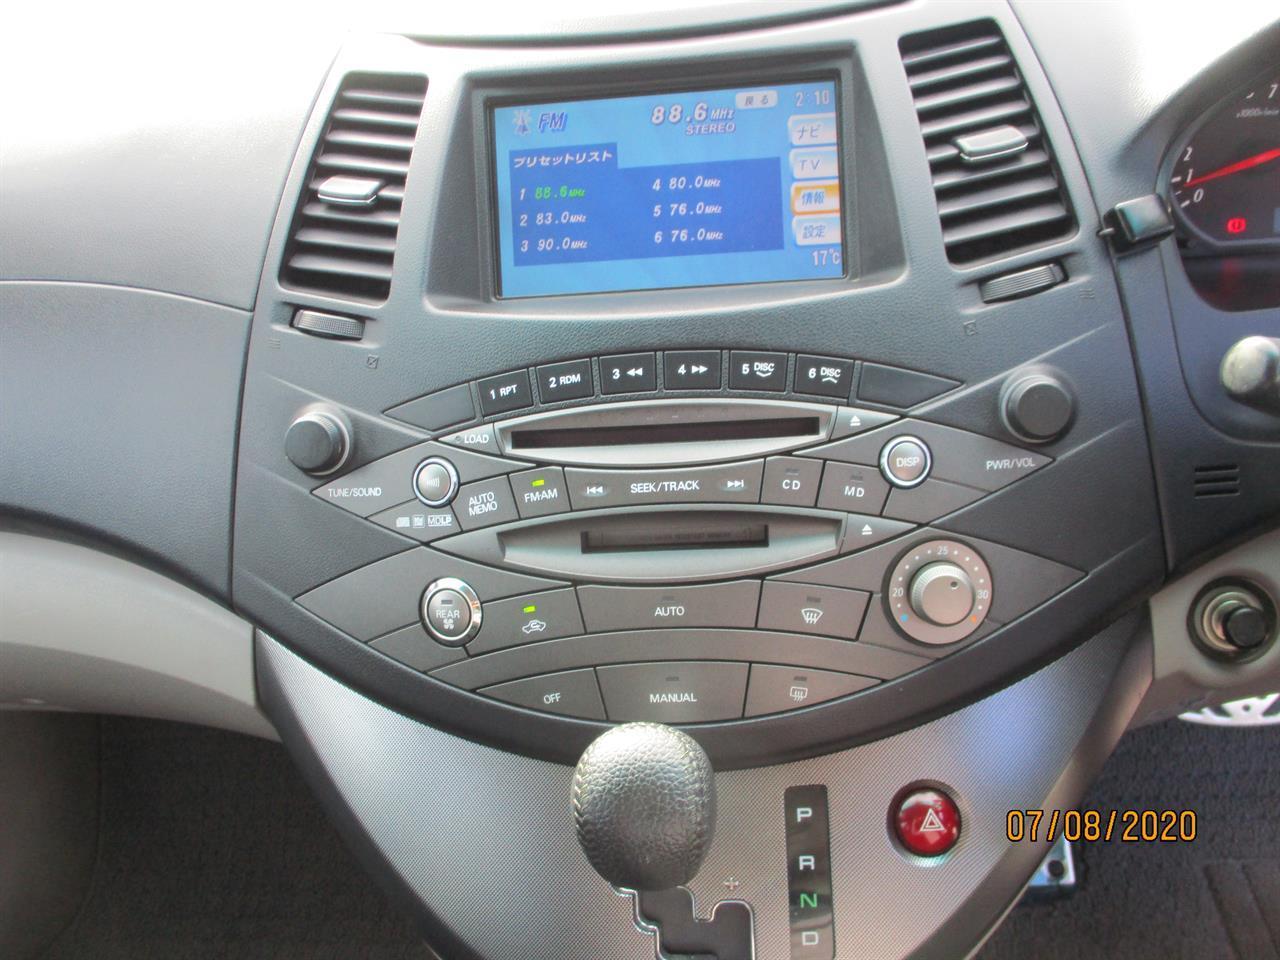 image-12, 2007 Mitsubishi Grandis 2.4 7 seater at Dunedin